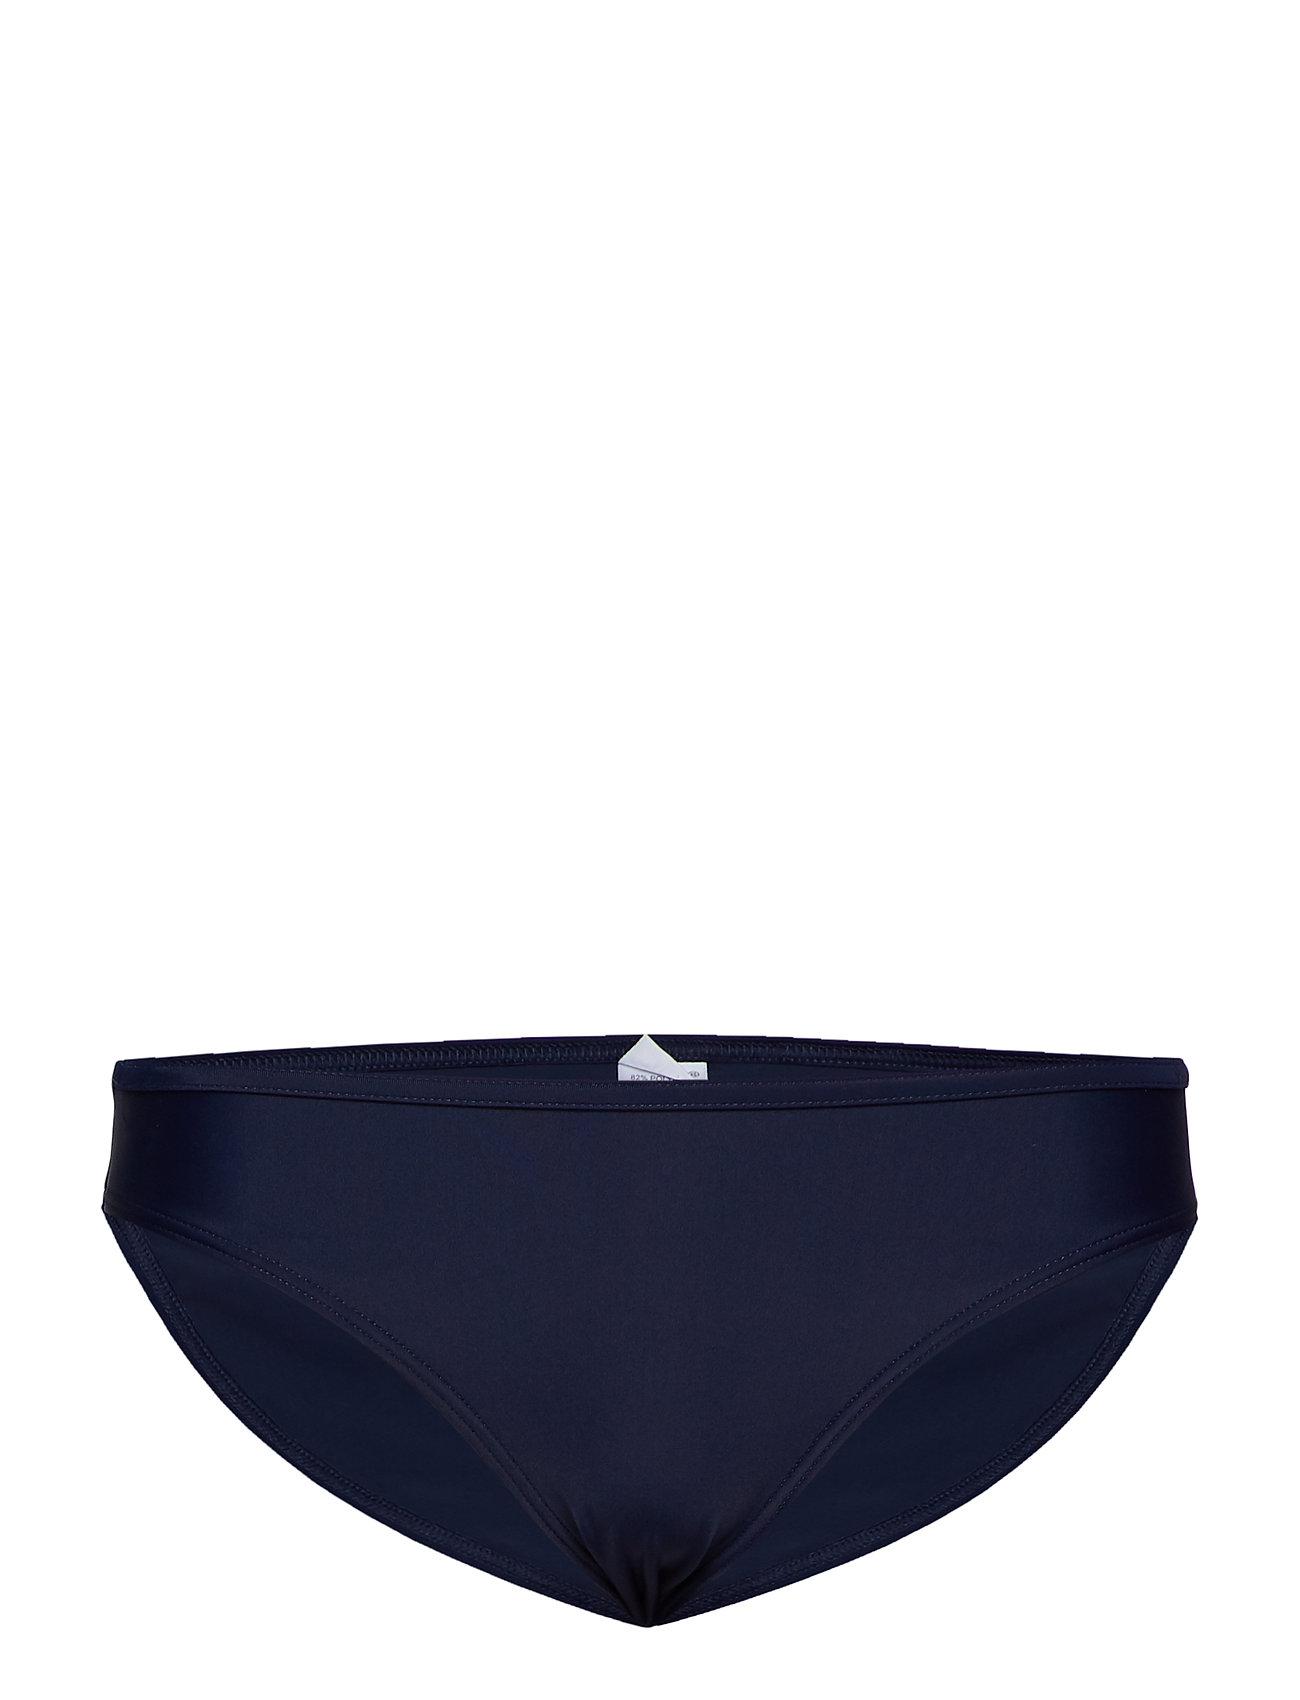 Image of Swim Tai Classic Bikinitrusser Blå Wiki (3086028851)